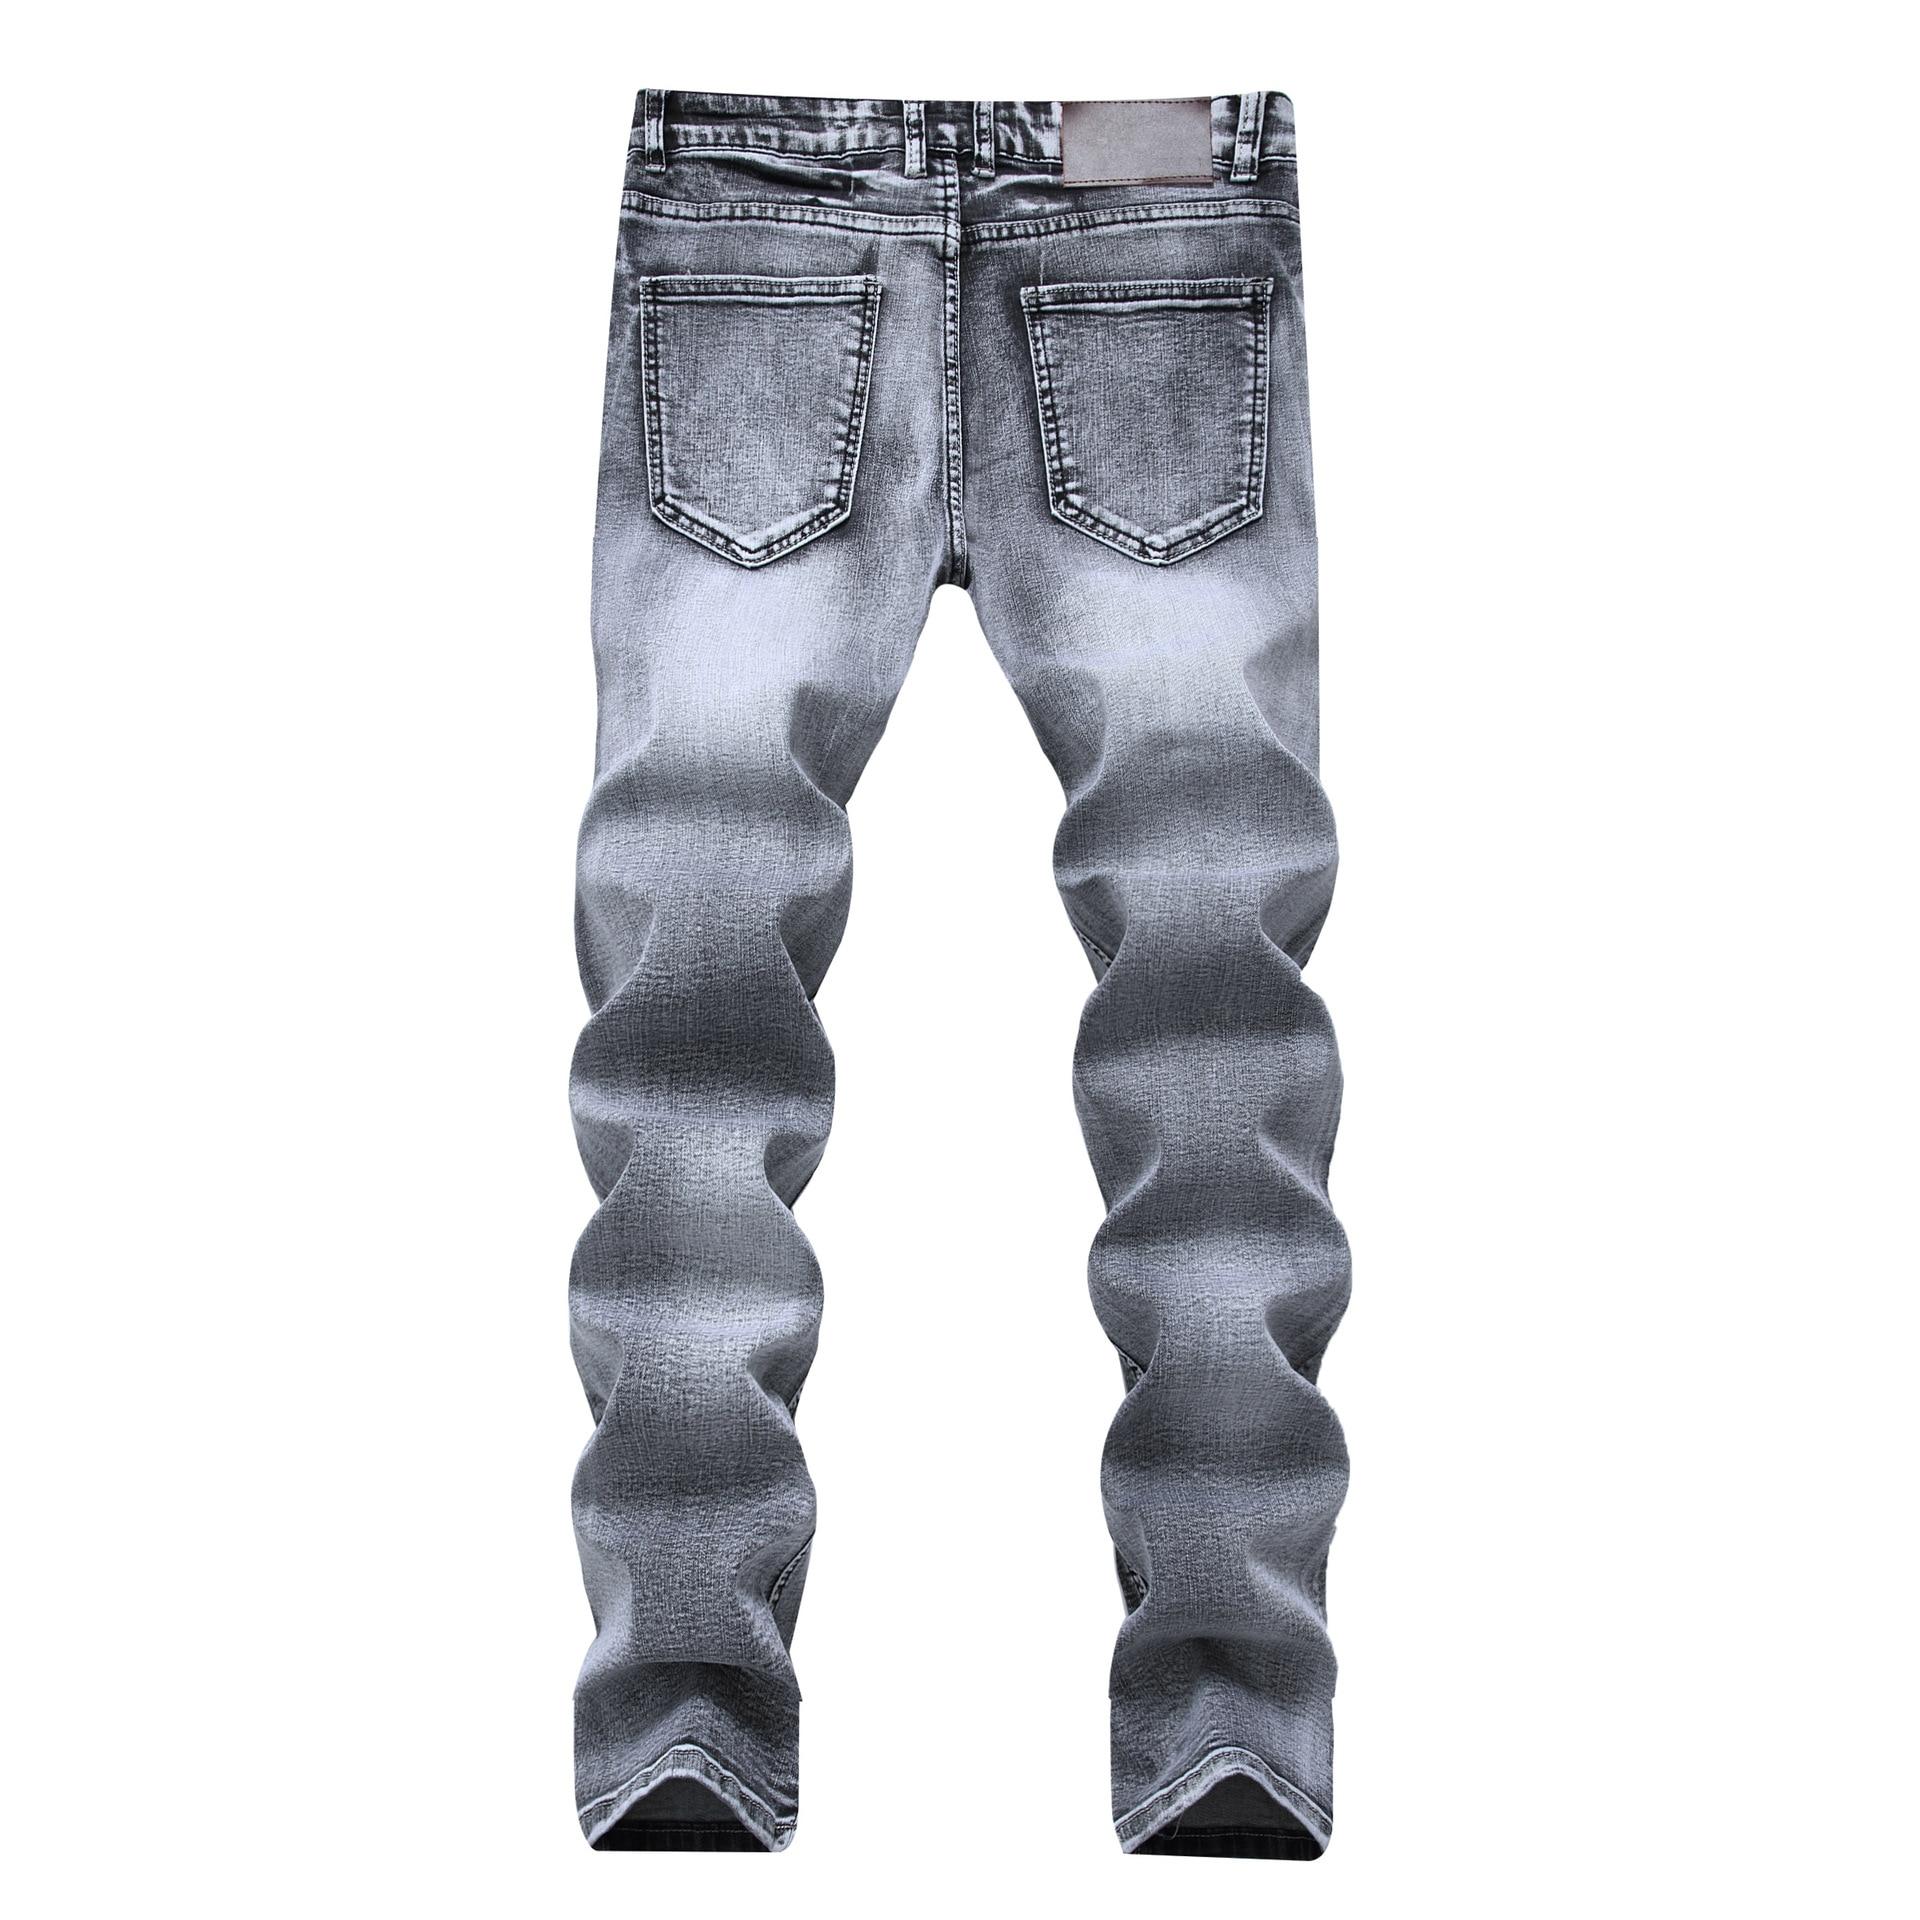 2018 pantalones de harén de invierno de los hombres hip hop suelto casual  mens pantalones costura alta calidad pantalones largos Jogger pista  pantalones ... 1eb84fe6d14